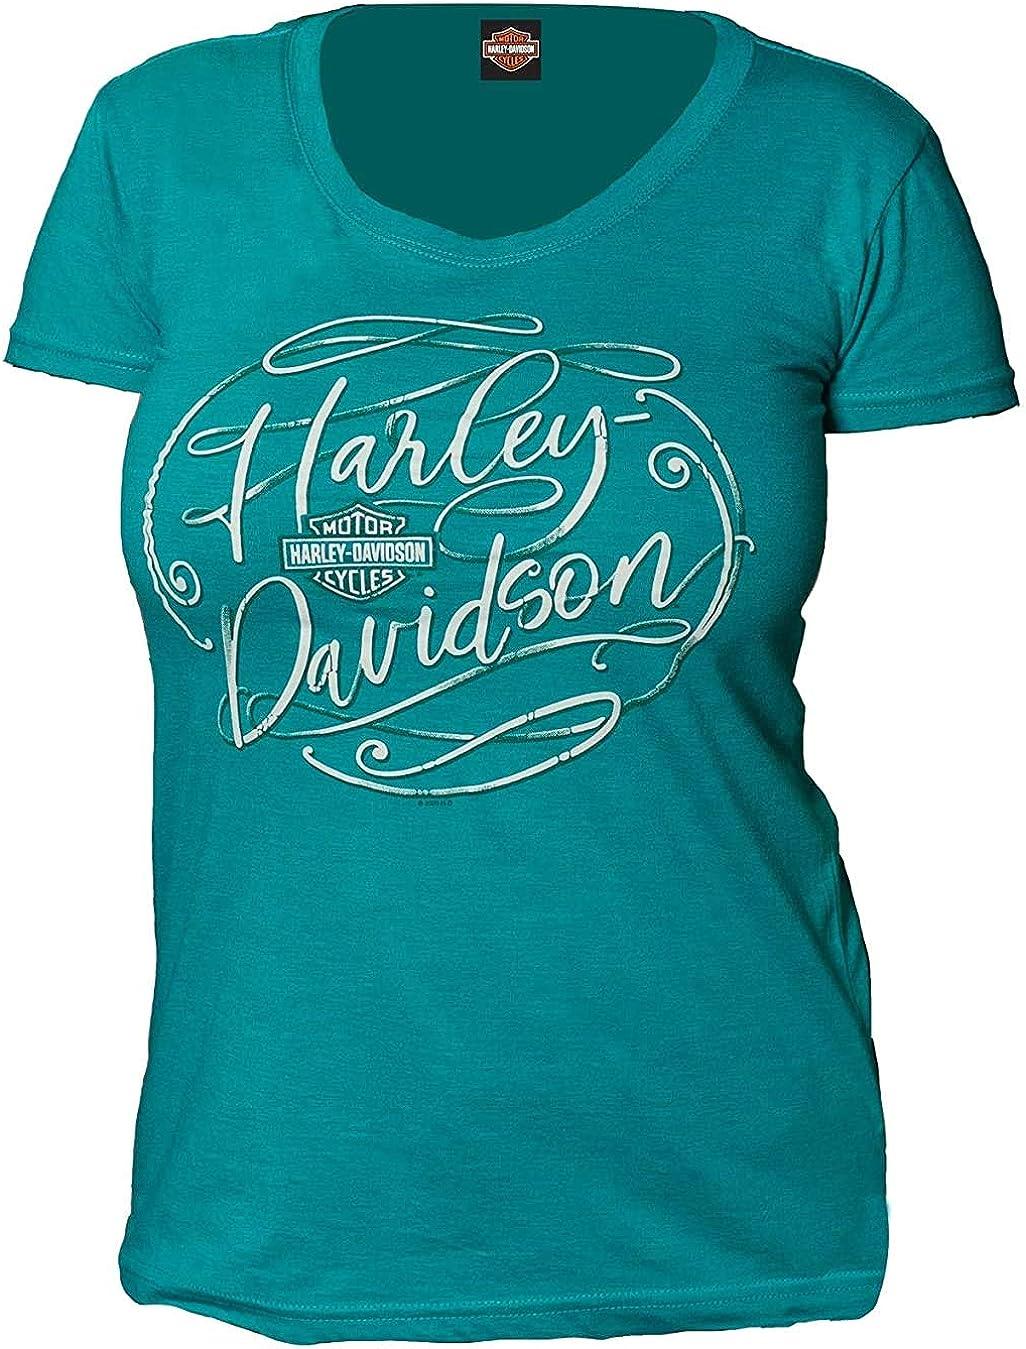 Womens Jade Round Neck Graphic T-Shirt Yokosuka Harley-Davidson Military Flowing Script